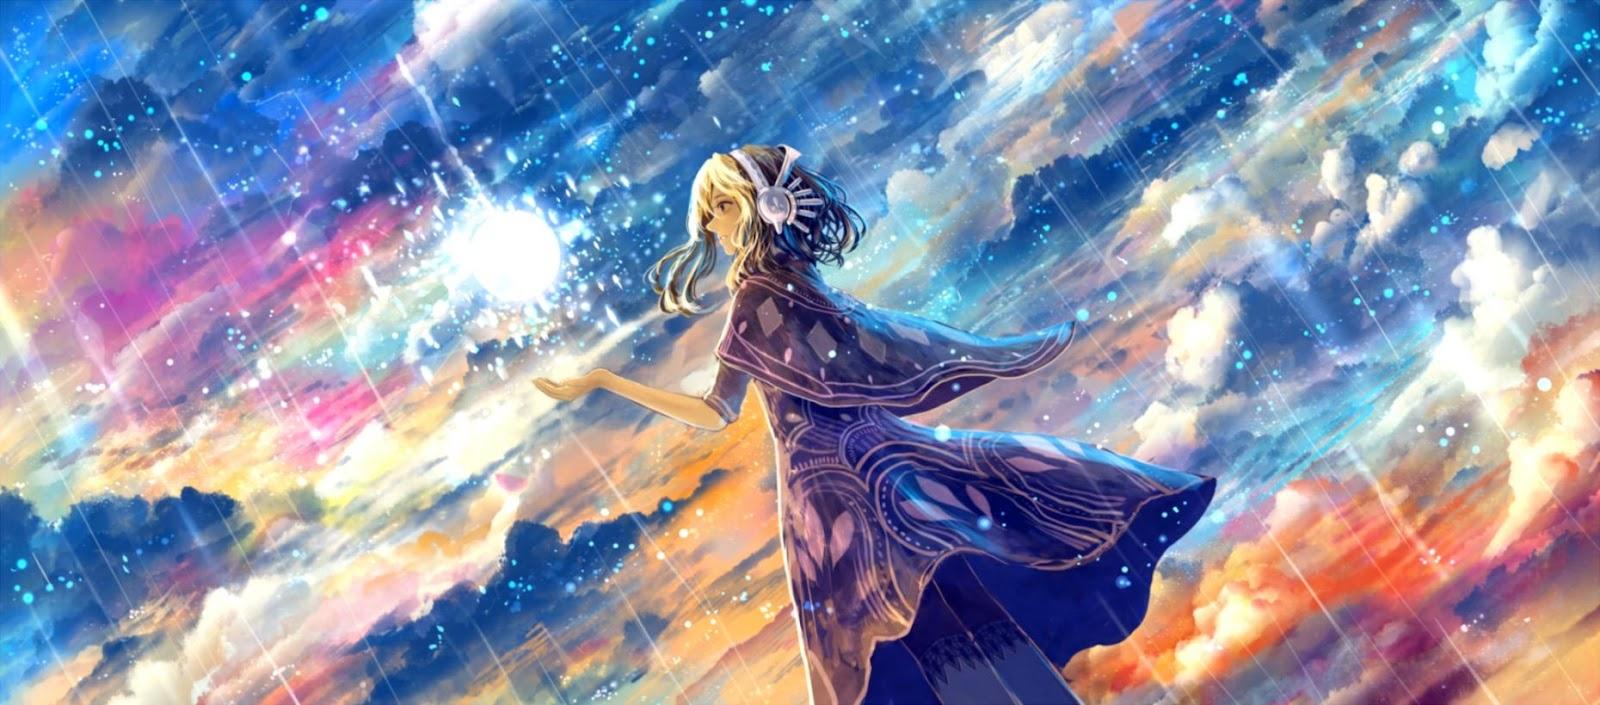 Anime Fantasy Art Wallpaper The Champion Wallpapers